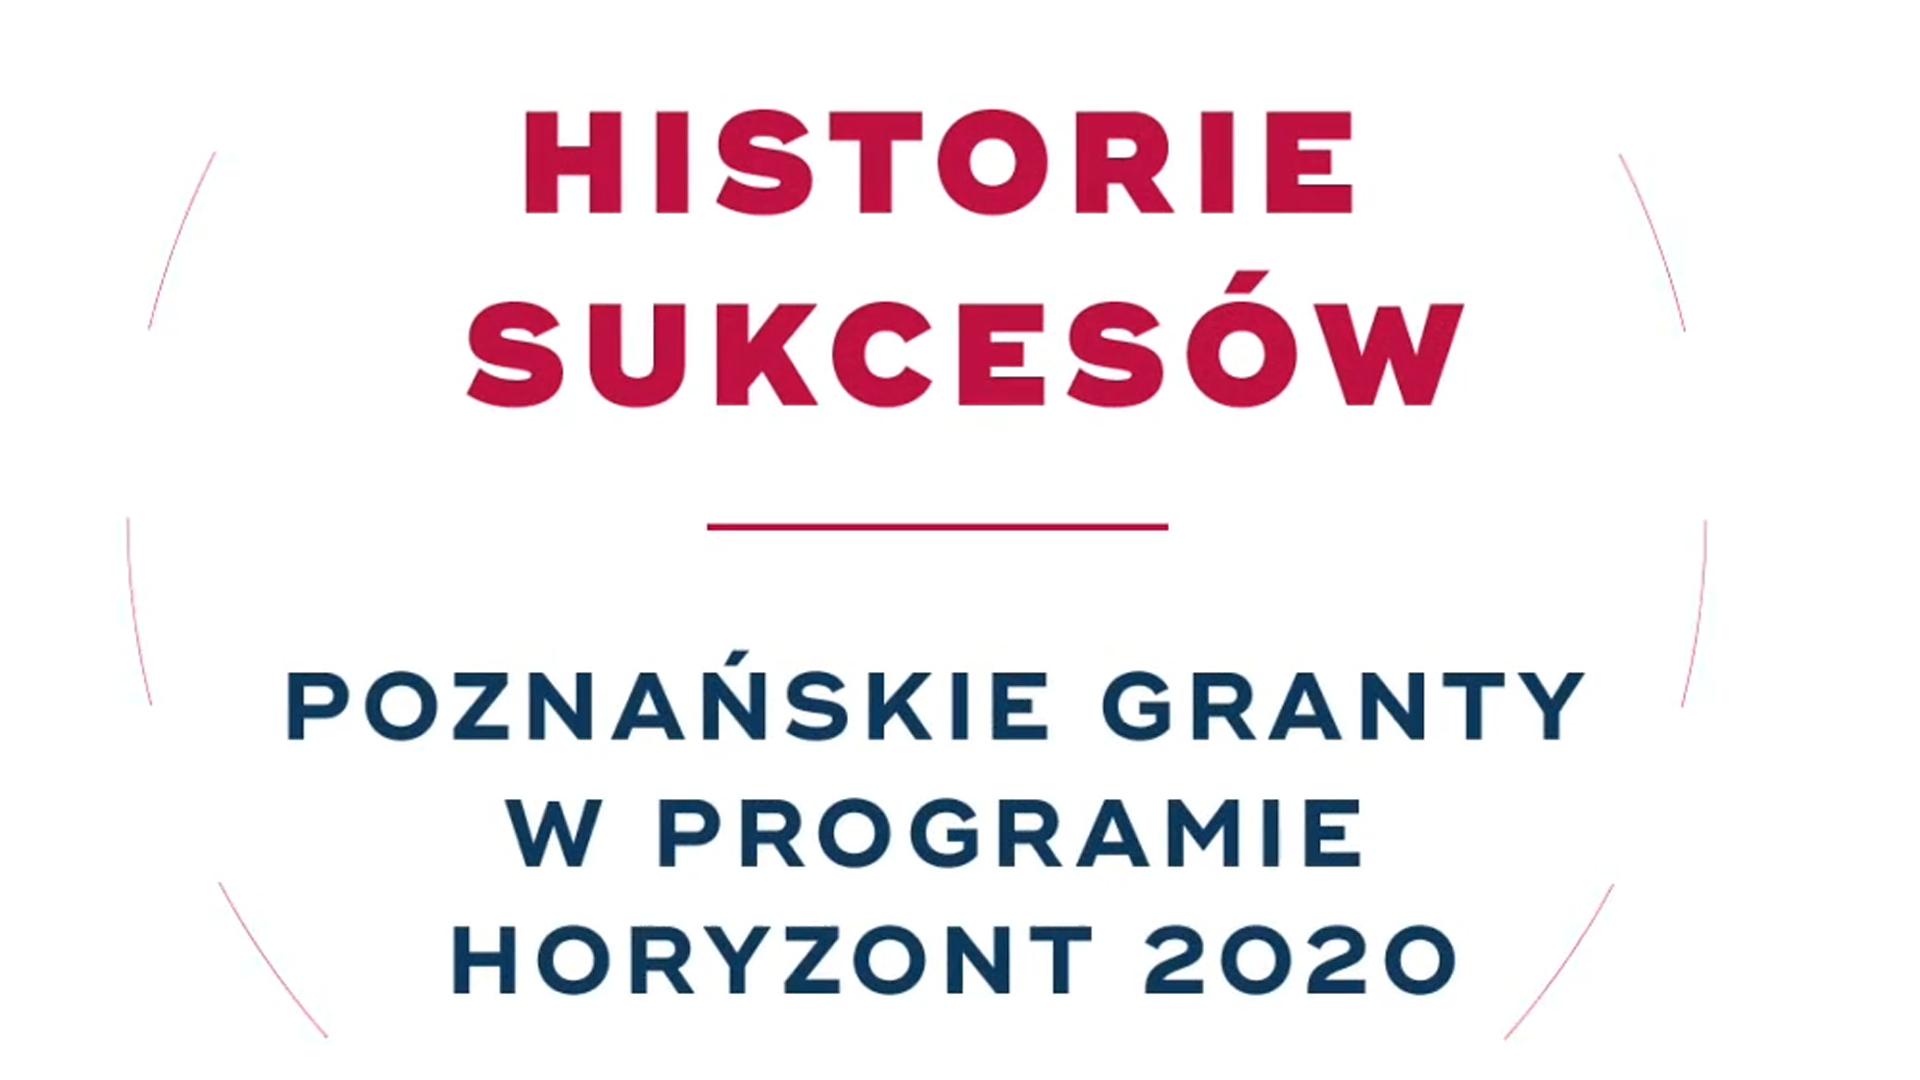 KPK: Historie sukcesów w Horyzoncie 2020